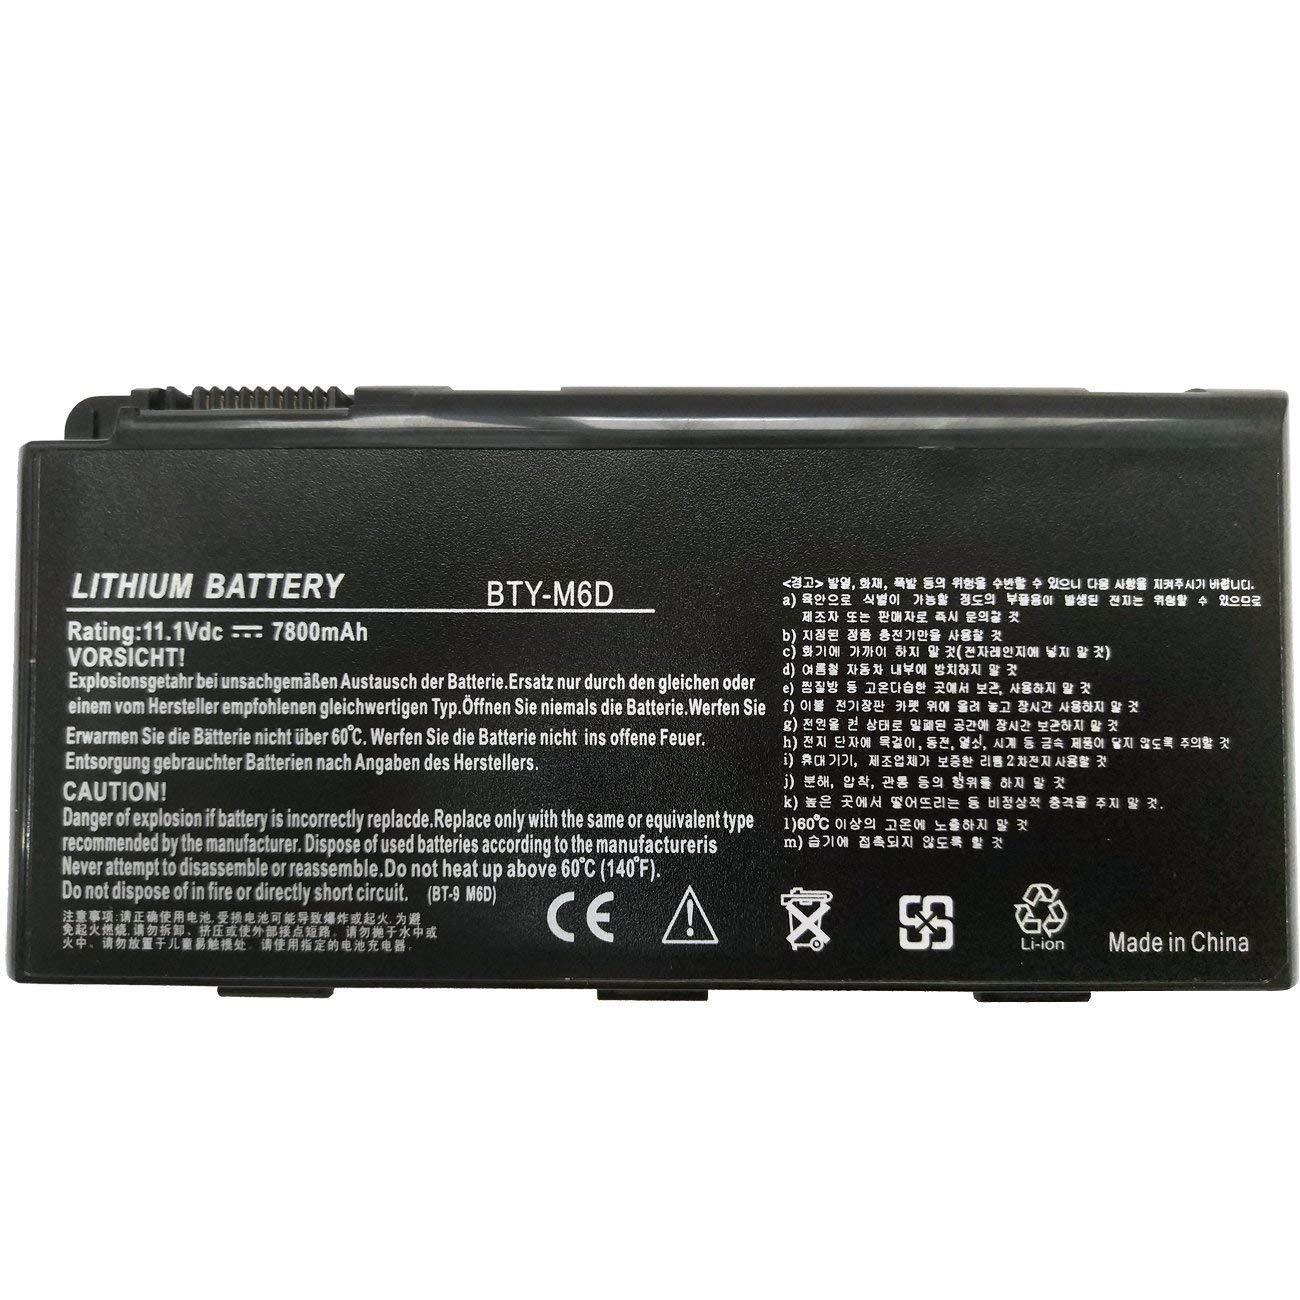 Bateria Bty-m6d 9 Celdas 7800mah MSI GT60 GX60 GT70 GT660 GX